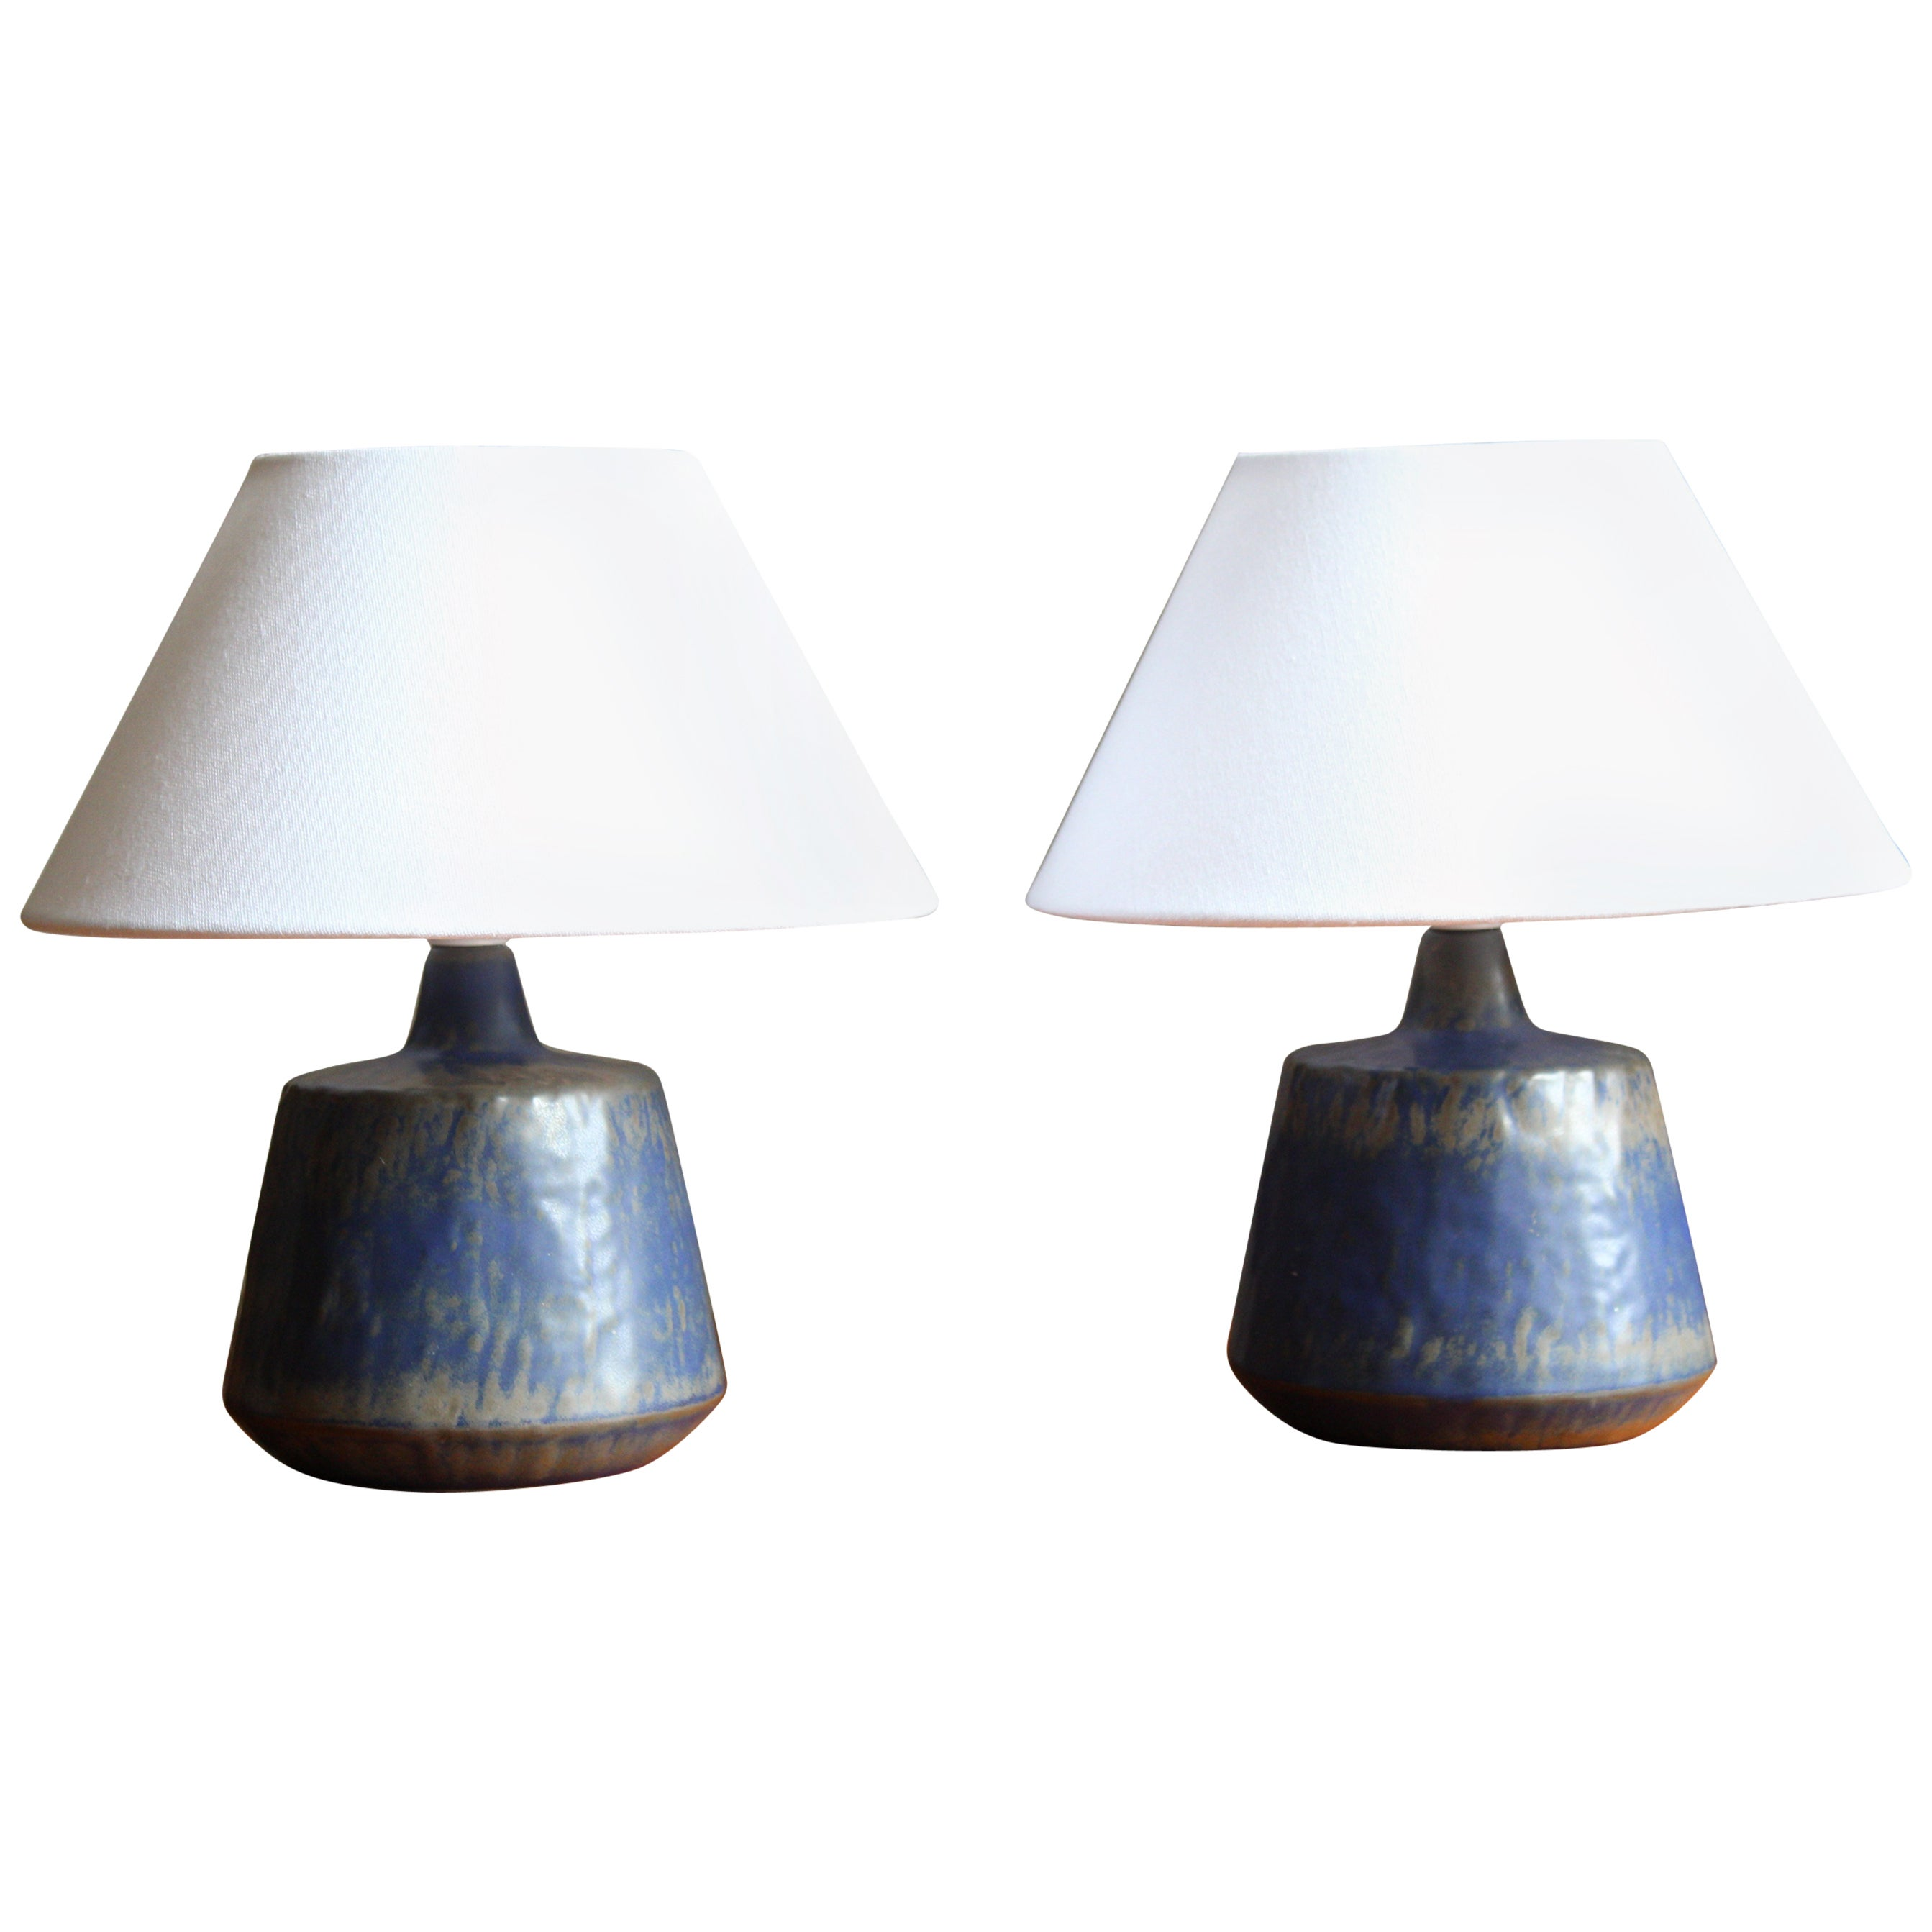 Gunnar Nylund, Table Lamps, Blue-Glazed Stoneware, Rörstand, Sweden, 1950s